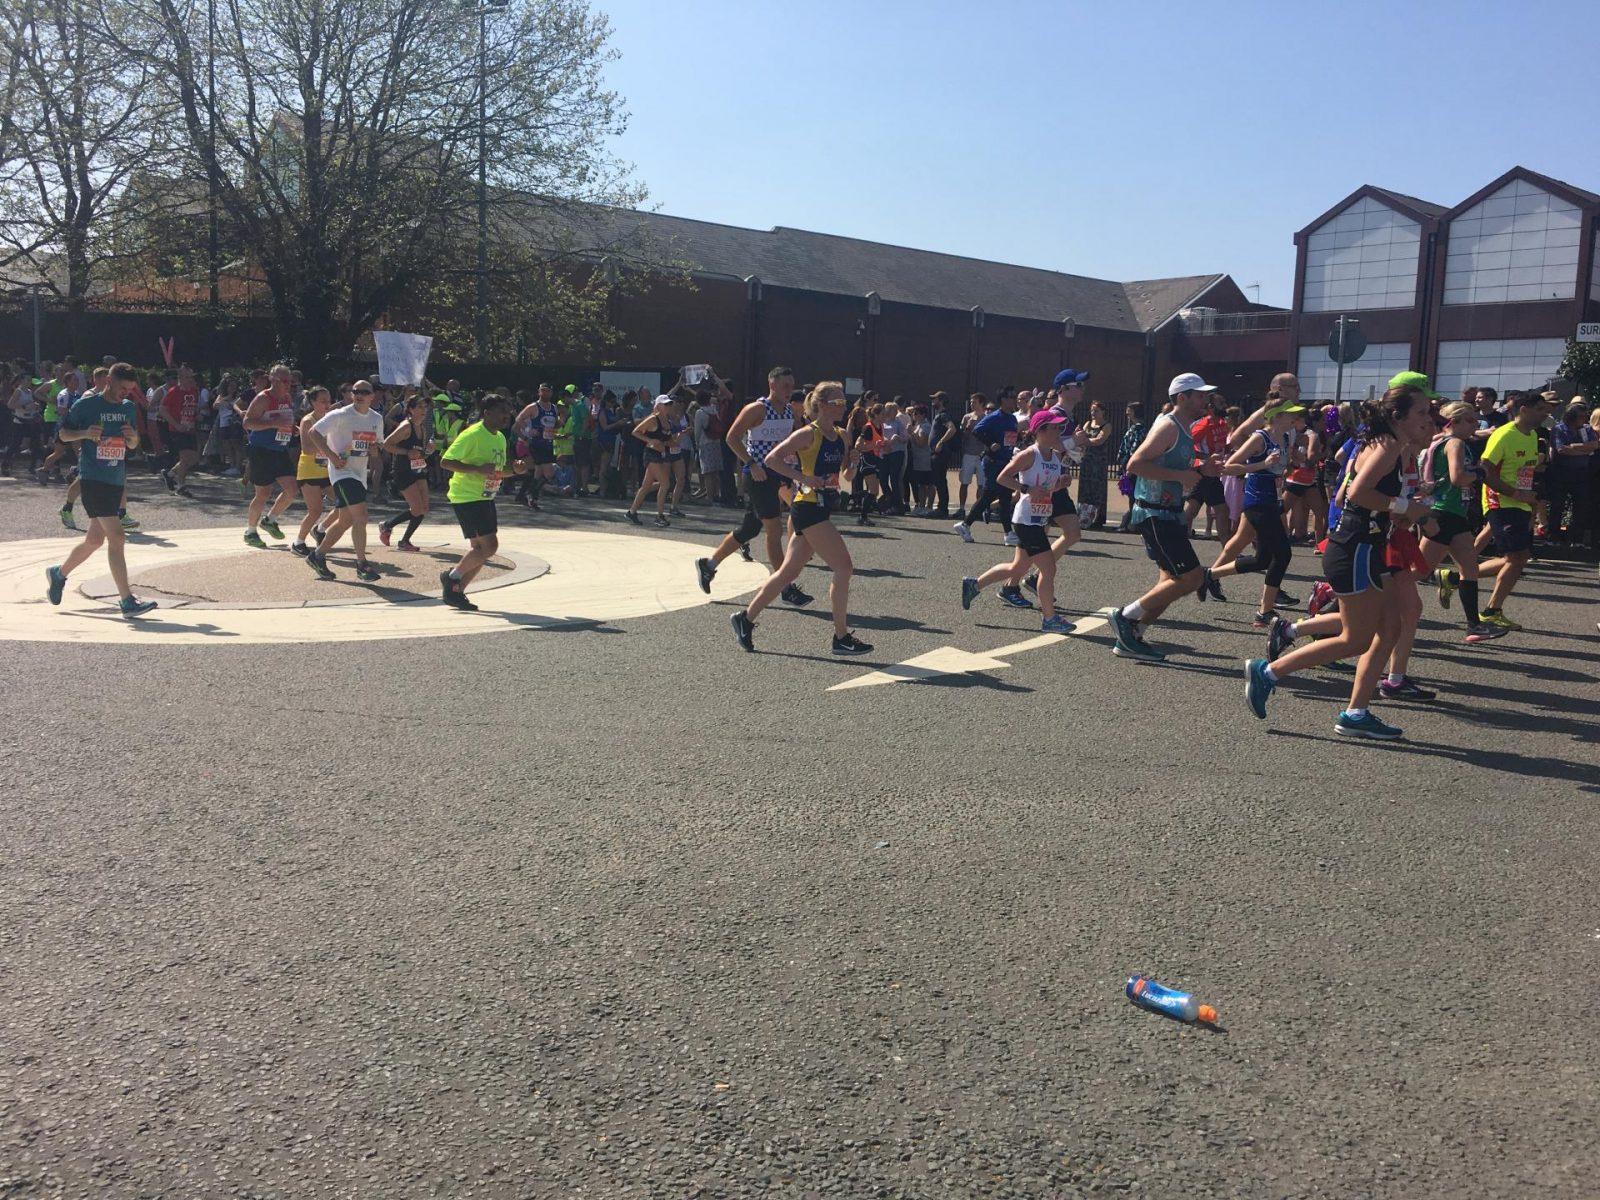 London Marathon spectators